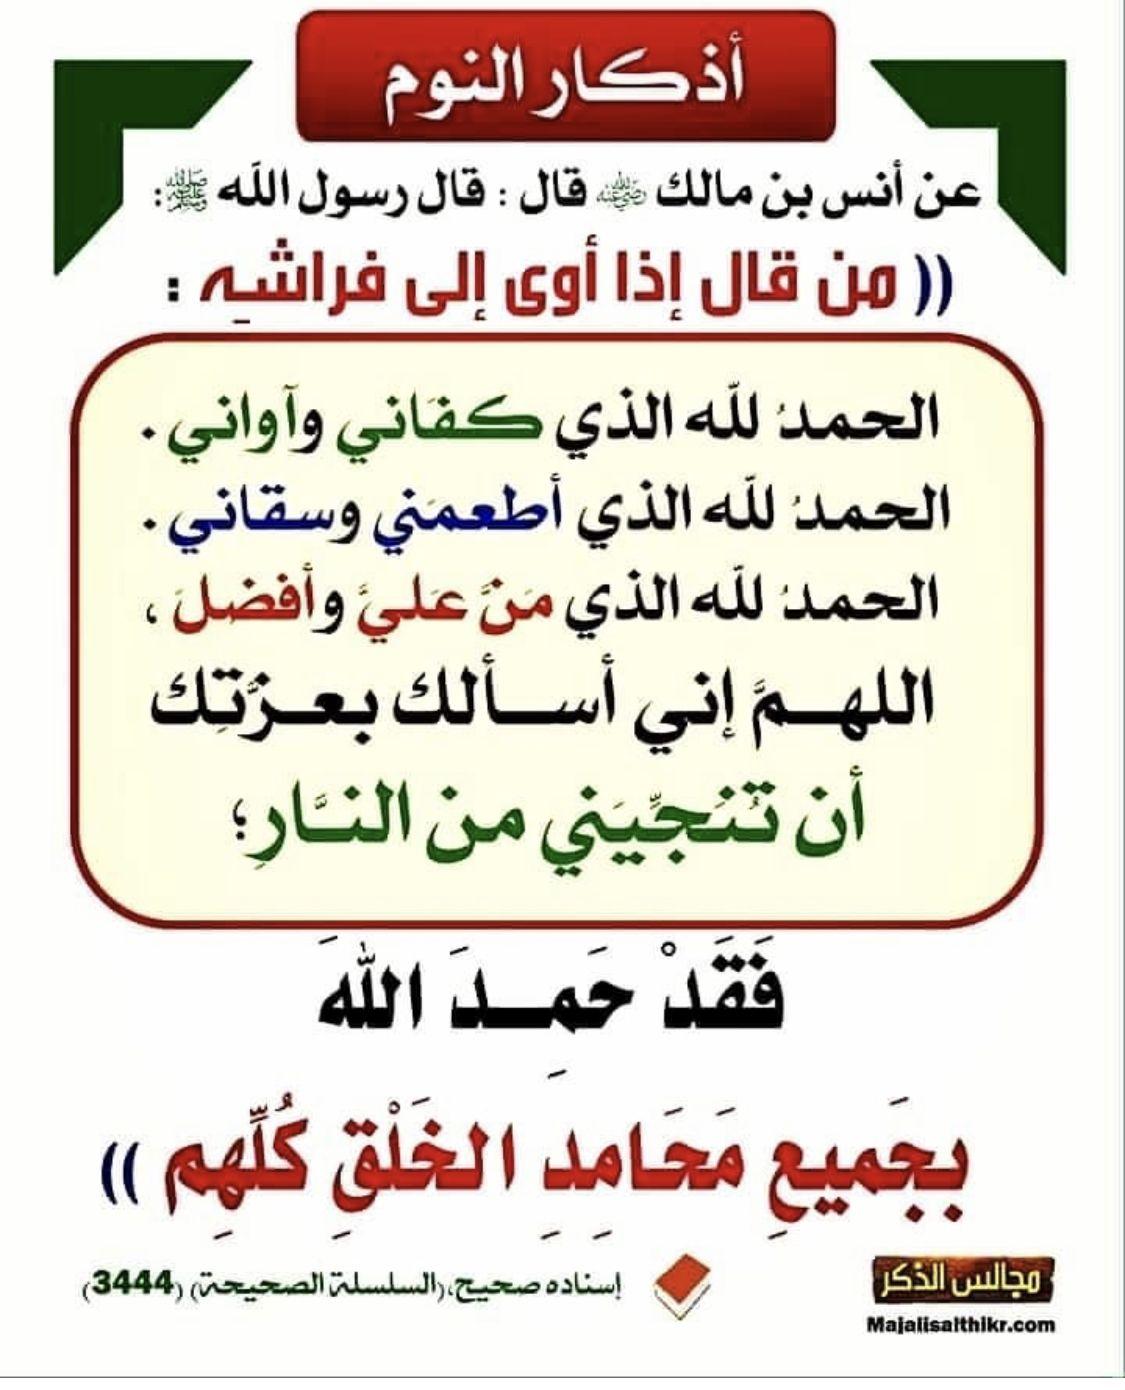 Pin By Simsim On حديث Ahadith Islamic Pictures Islam Hadith